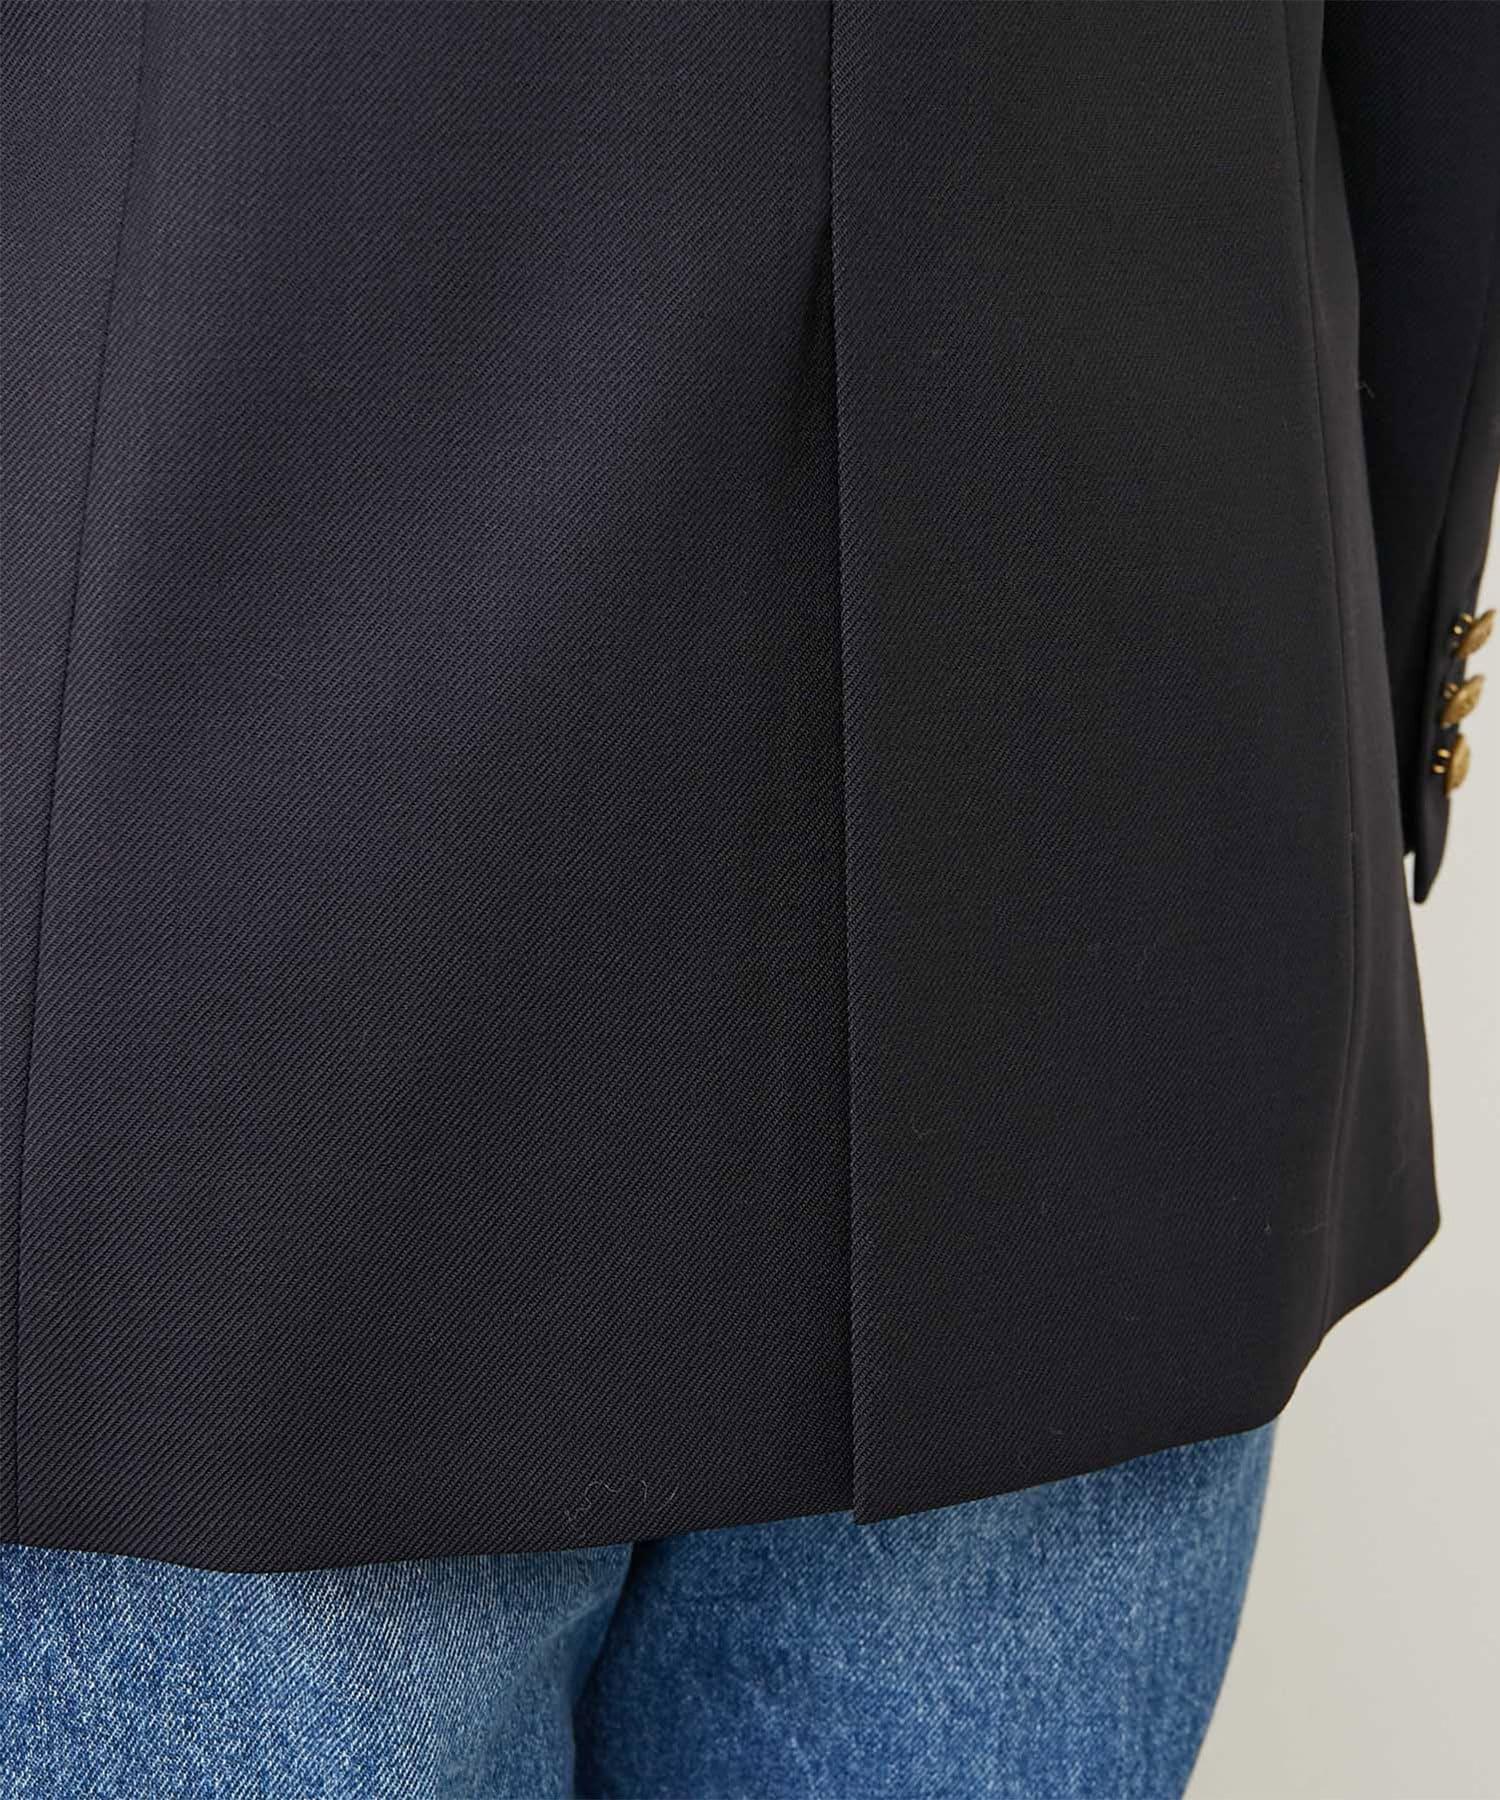 GALLARDAGALANTE(ガリャルダガランテ) ダブルブレザージャケット